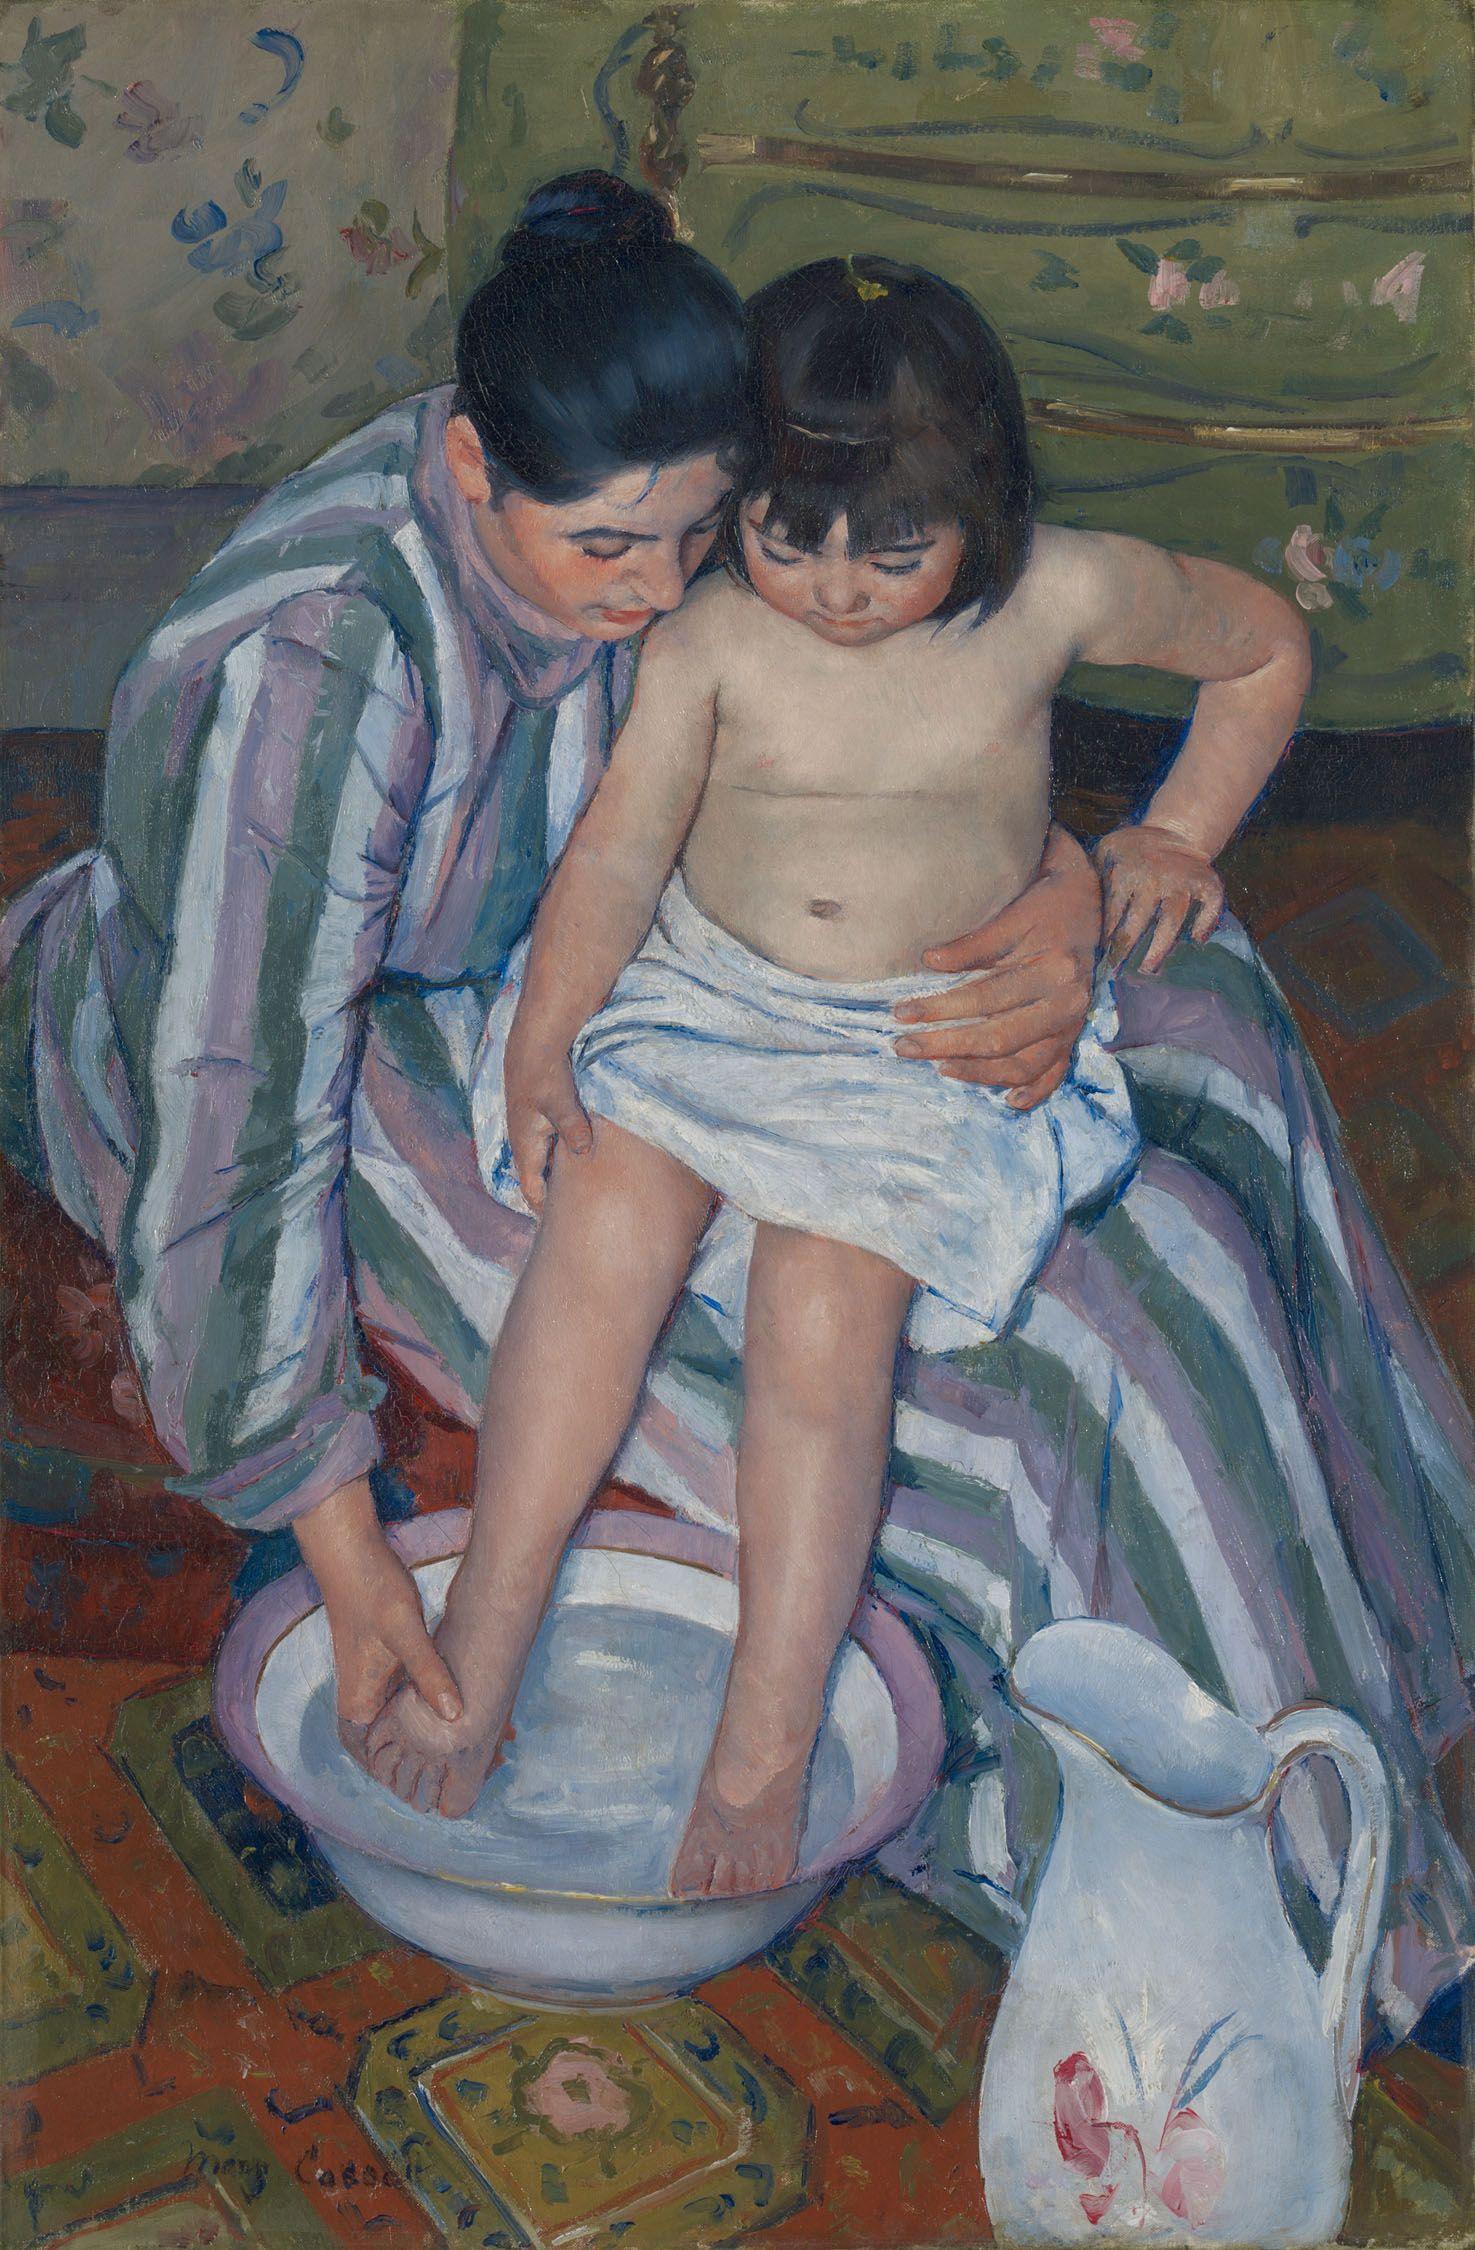 The_Childs_Bath_by_Mary_Cassatt_1893.jpg